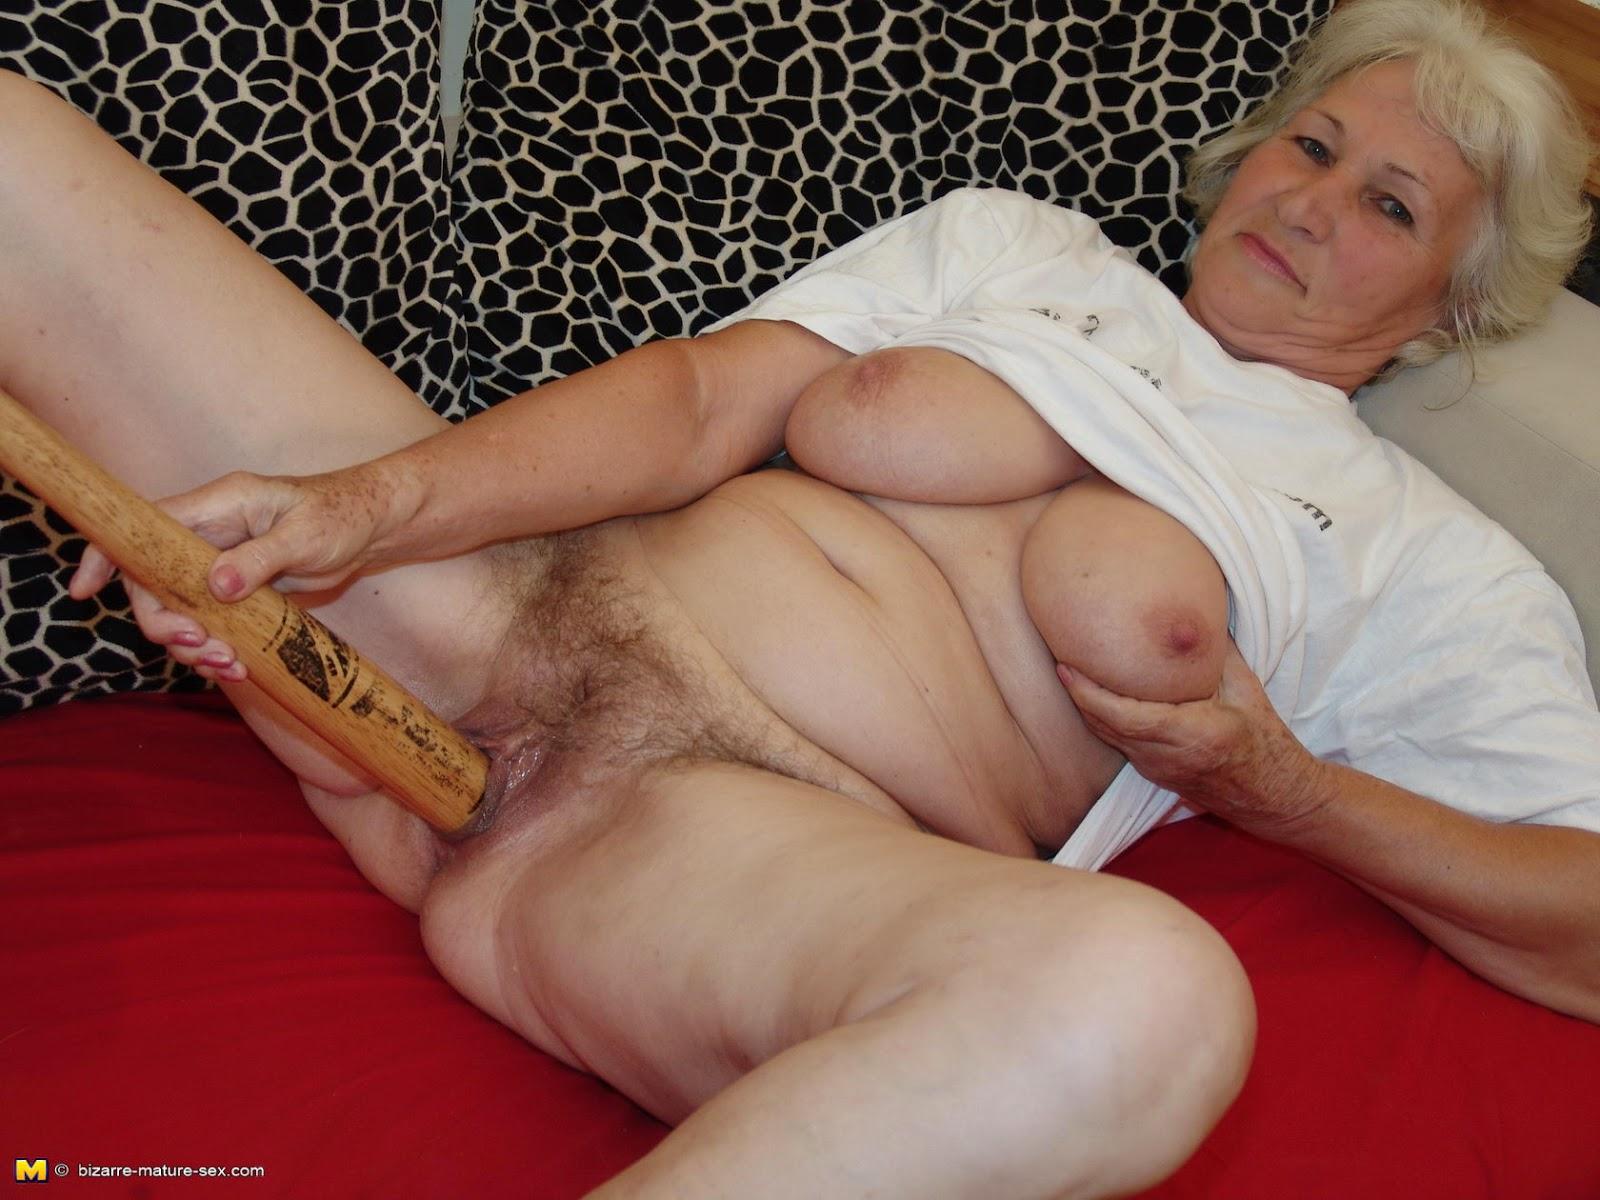 Beautiful pinay nude pic